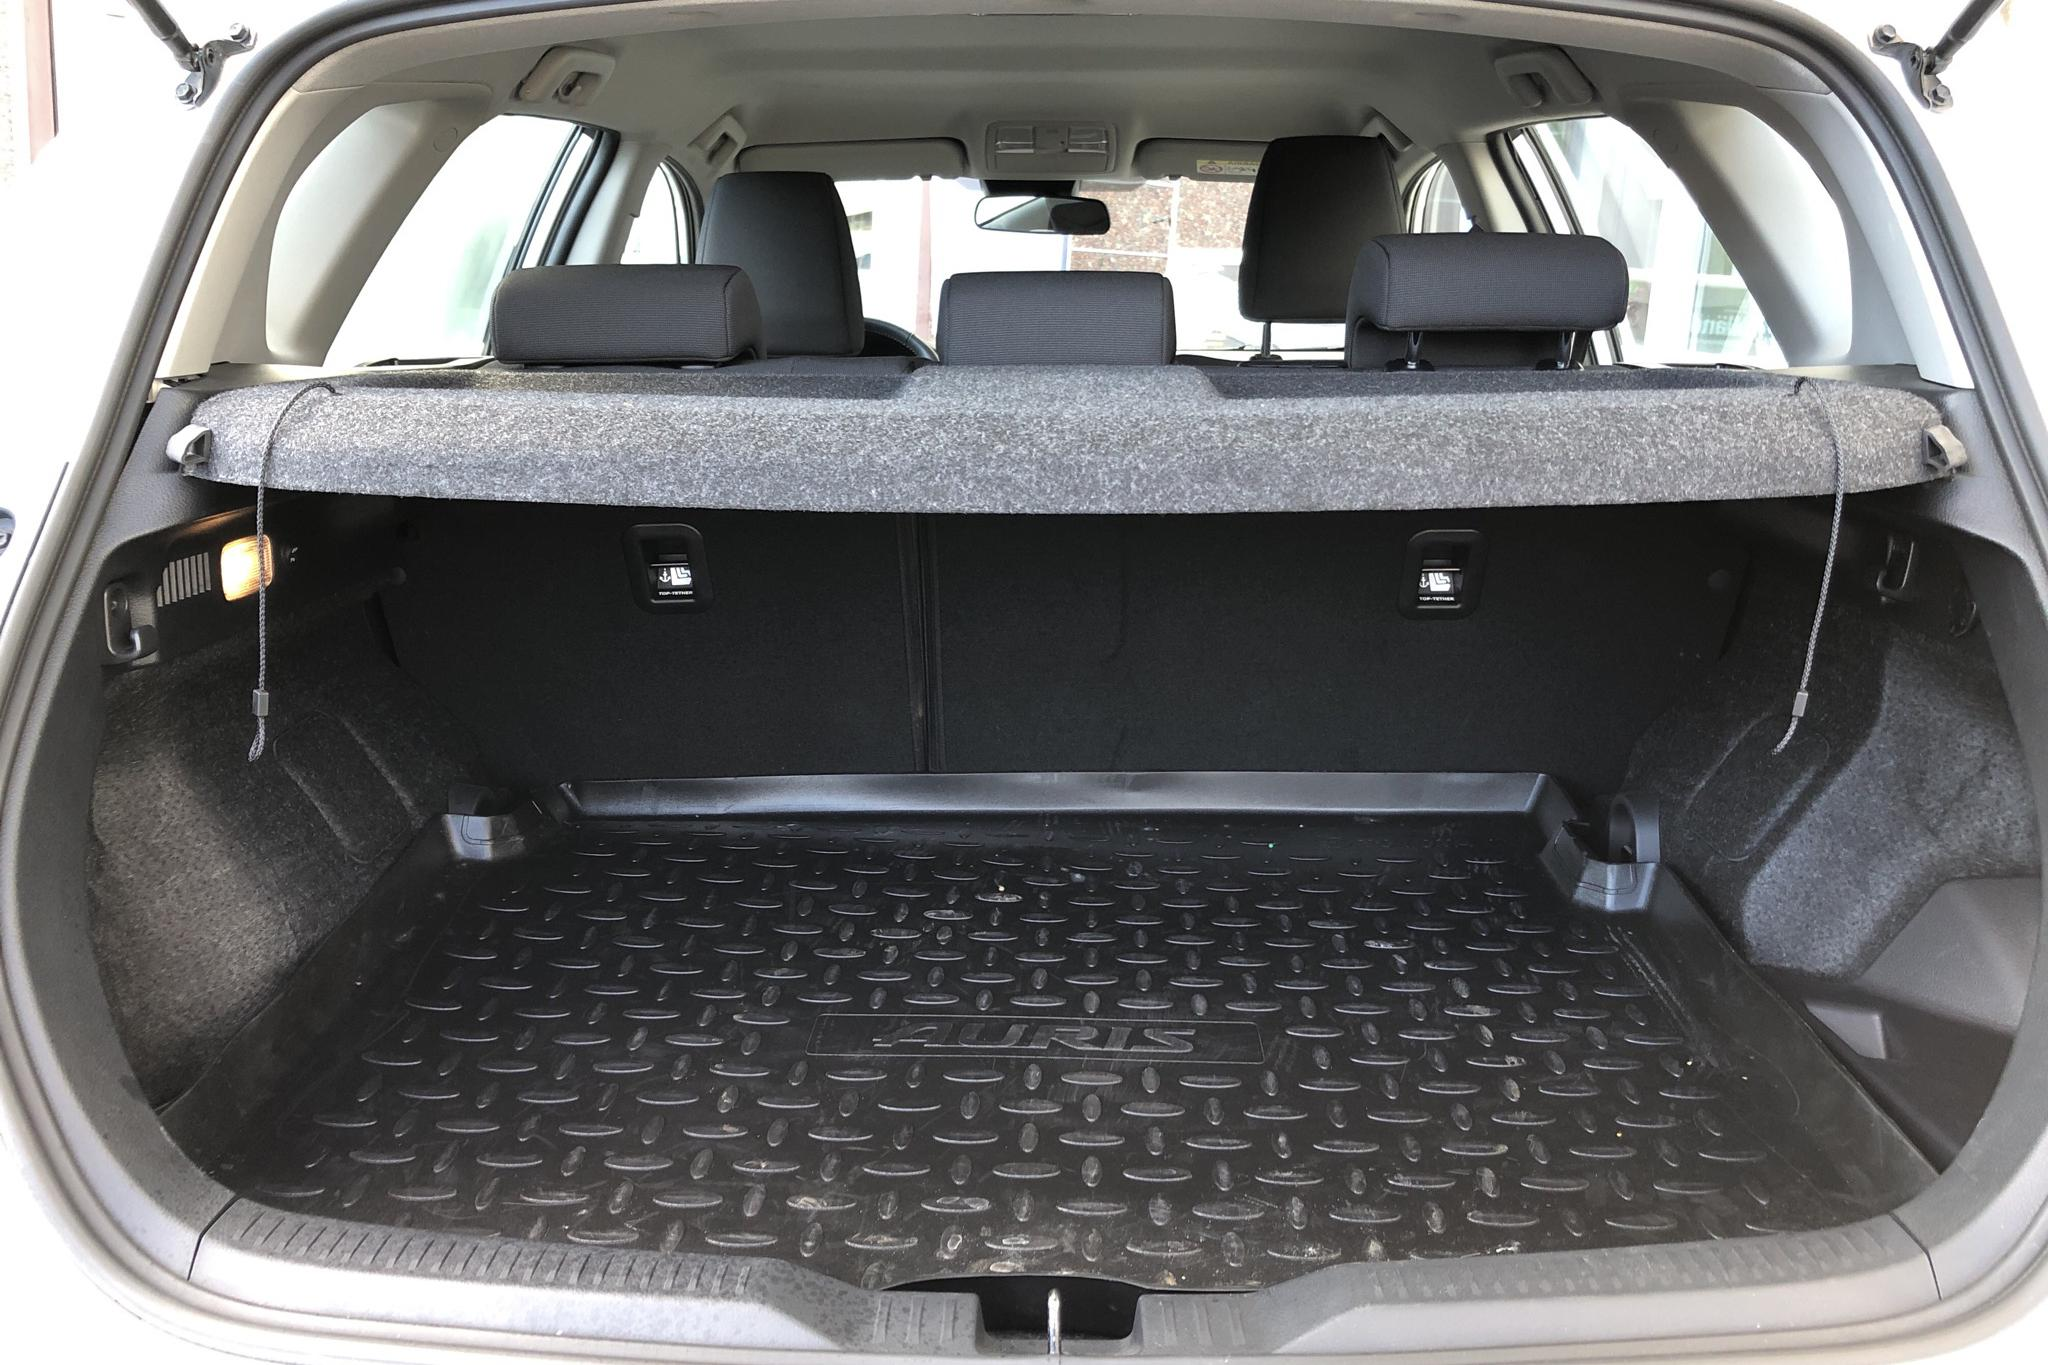 Toyota Auris 1.8 HSD 5dr (99hk) - 18 620 km - Automatic - white - 2018